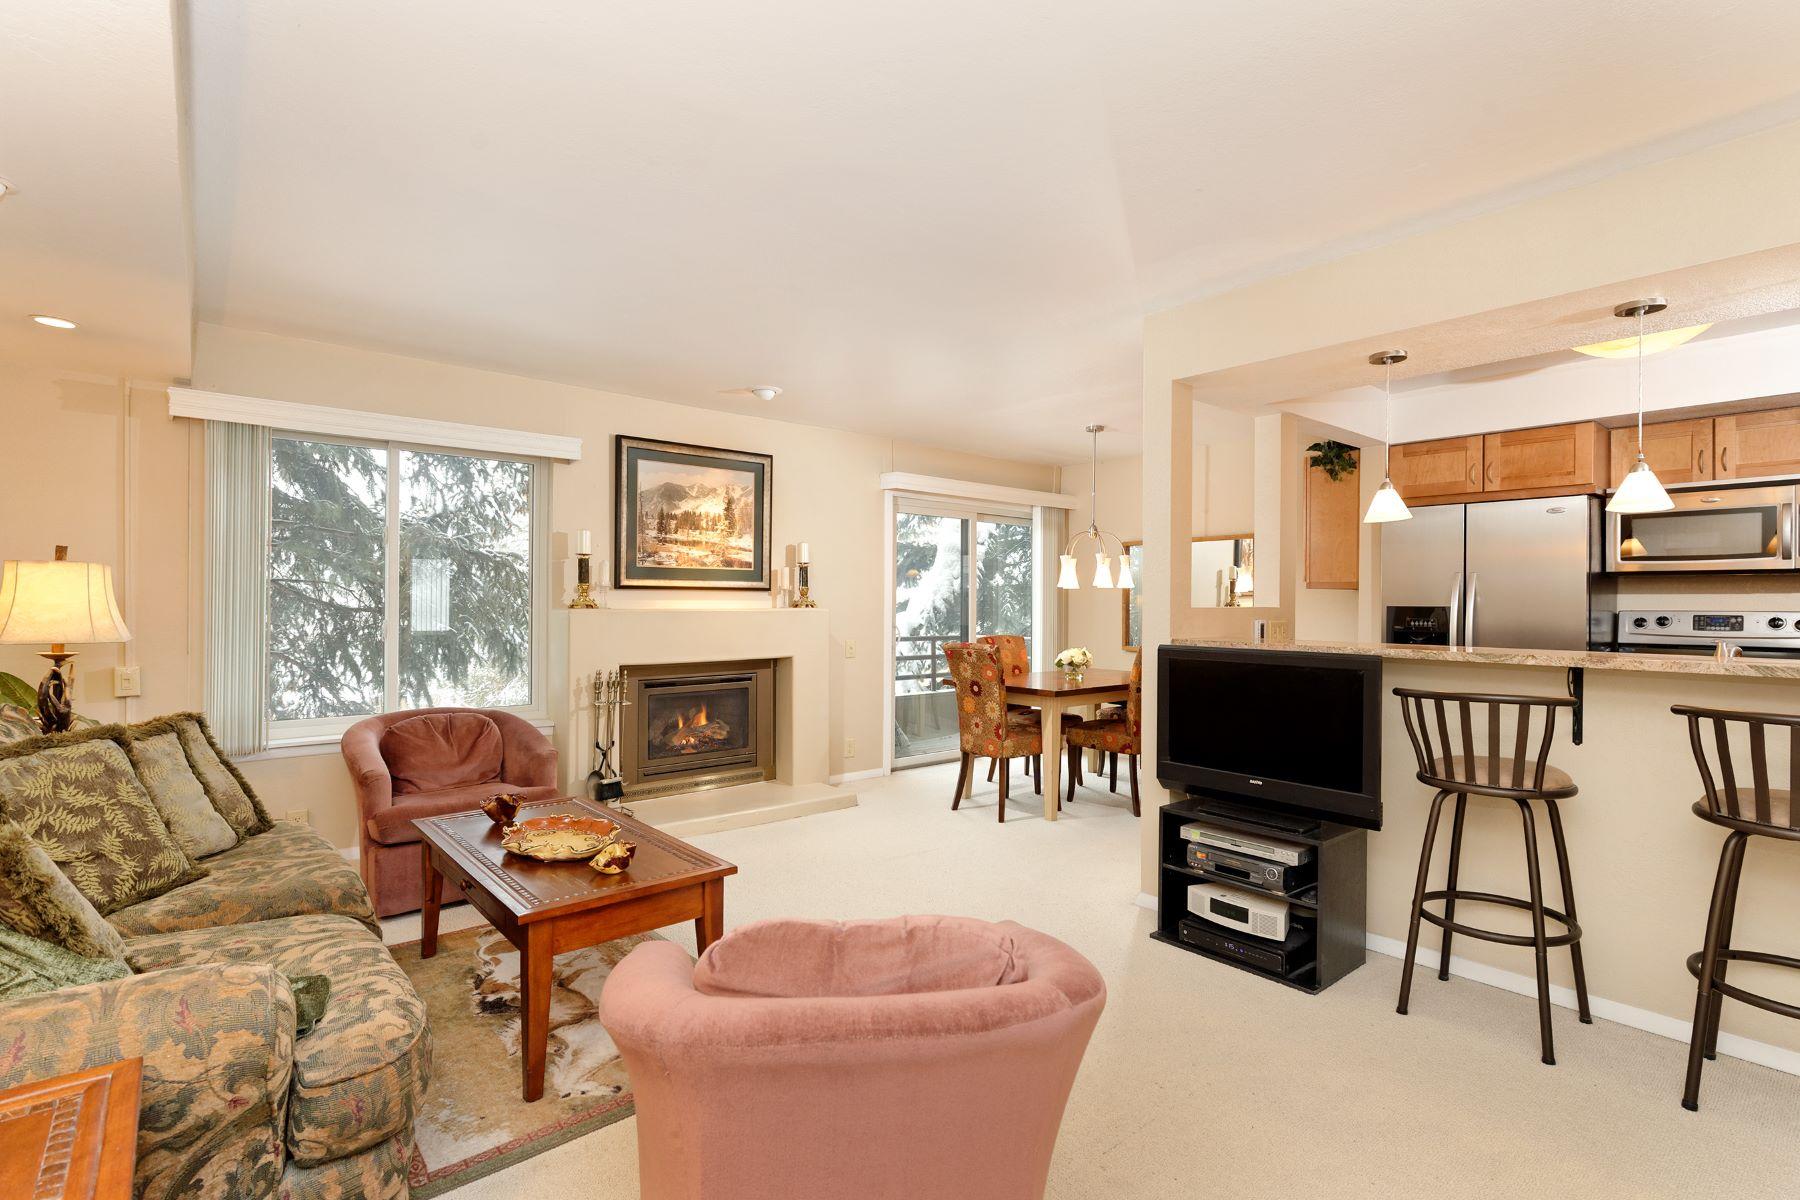 共管物業 為 出售 在 Lovely Seasons Four Condominium 35 Lower Woodbridge Road Unit 175 Snowmass Village, 科羅拉多州, 81615 美國